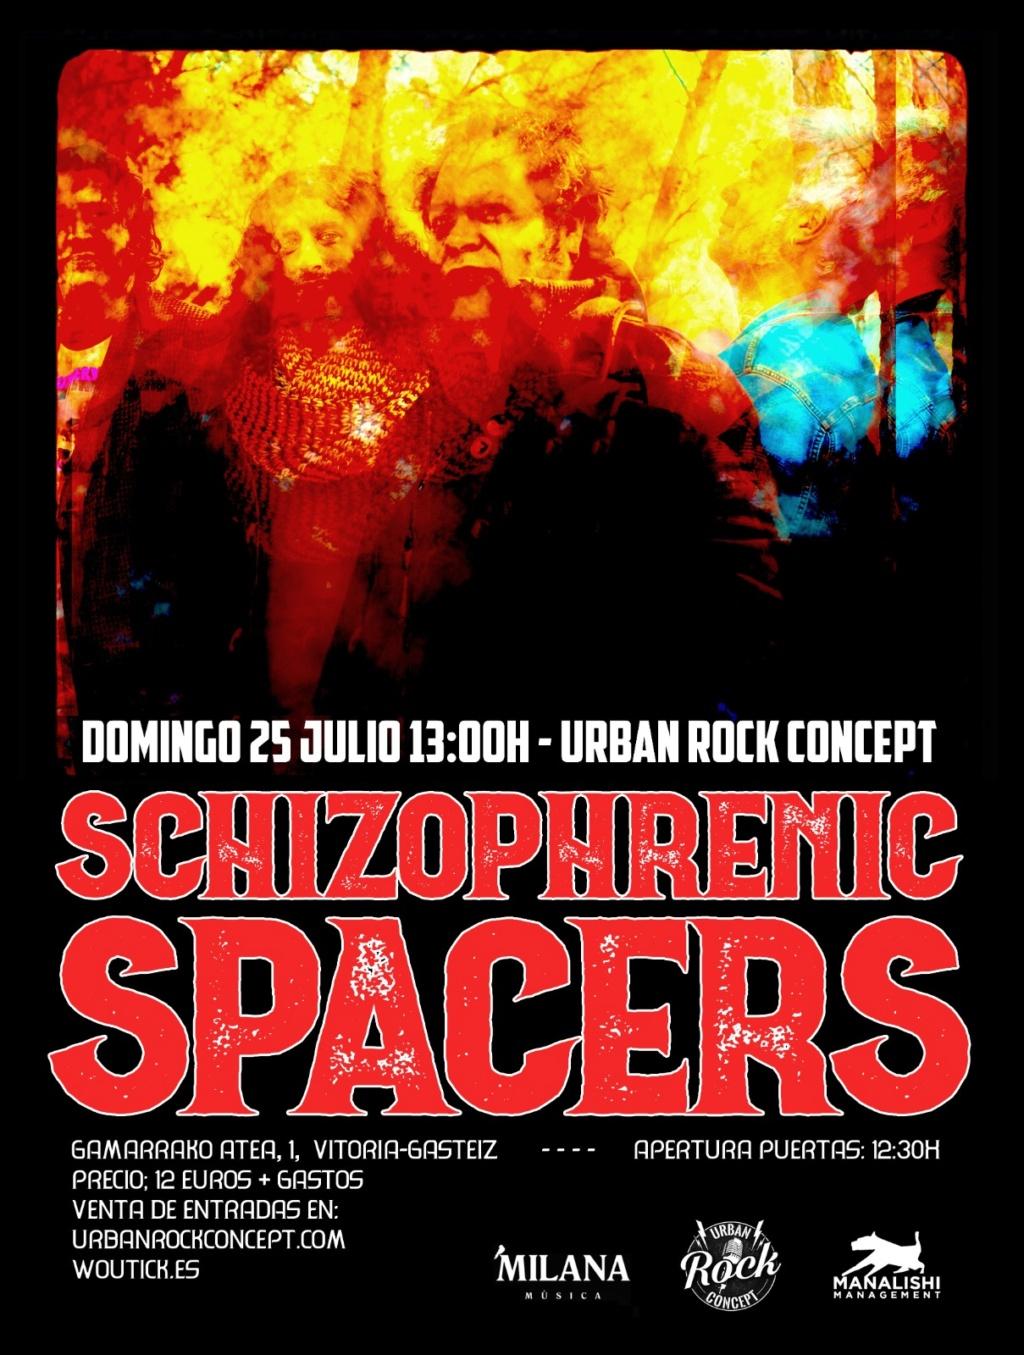 SCHIZOPHRENIC SPACERS NECESITAN VUESTRA AYUDA!! - Página 2 Img-2014